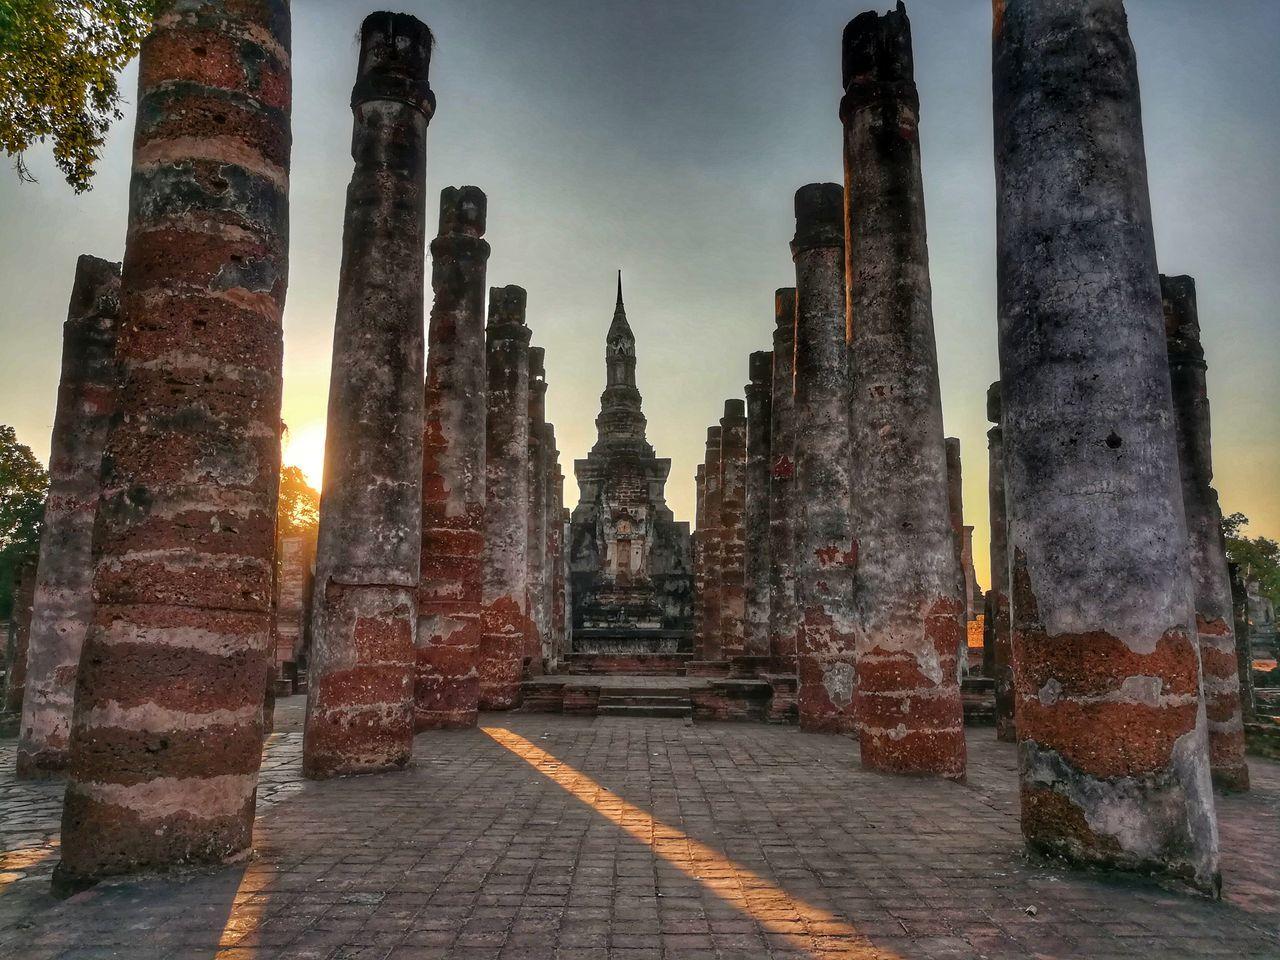 No People Sukhothai Sukhothaihistoricalpark Thailand Tourism Travel Travel Destinations EyeEm Best Shots EyeEm EyeEm Nature Lover